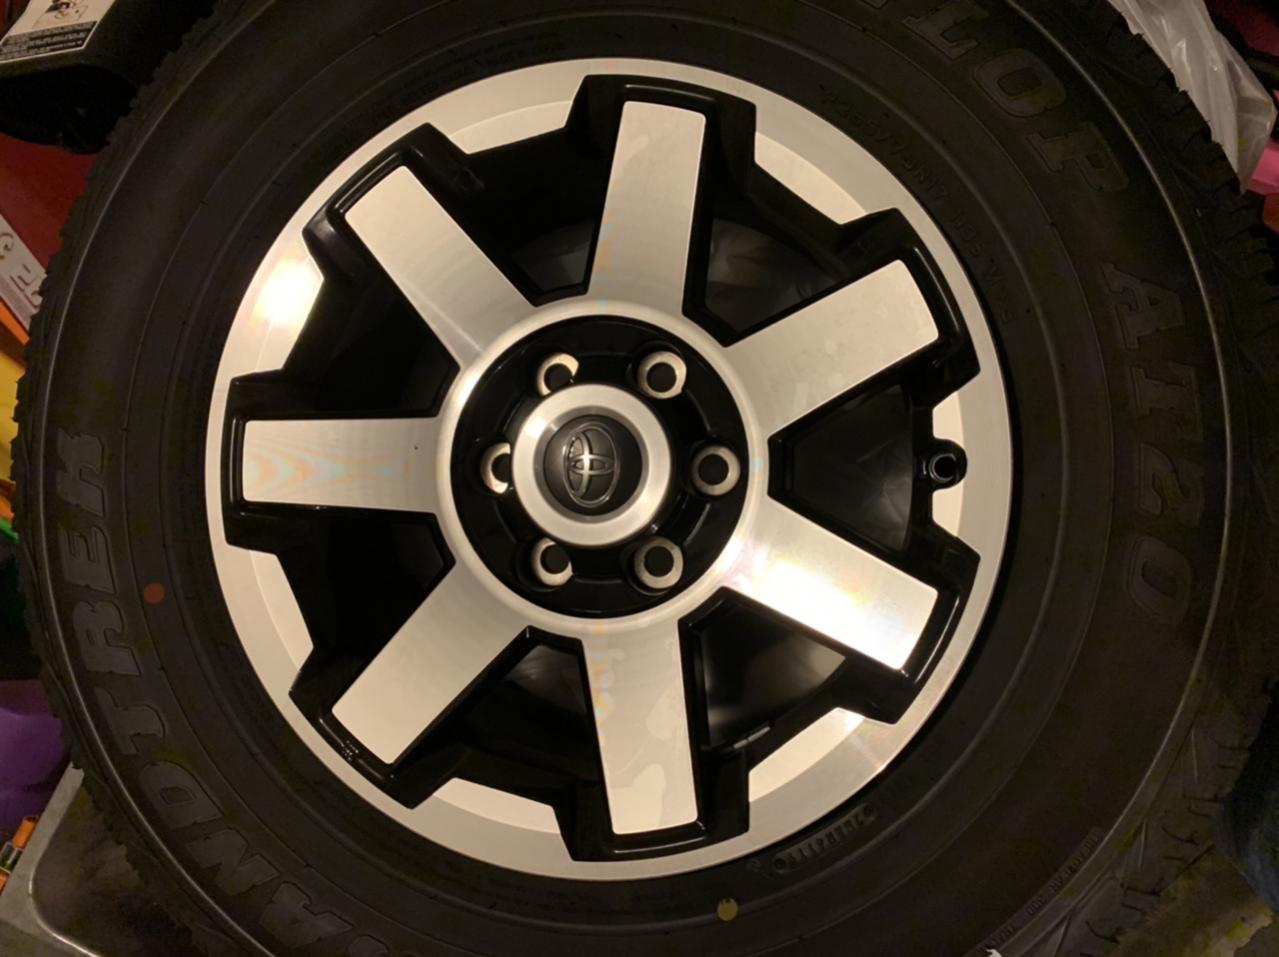 FS: 5th Gen Wheel/Rims & Tires - 00 [Central Pennsylvania]-c1649c1b-3706-4eb0-bdc4-4356572ce206-jpg